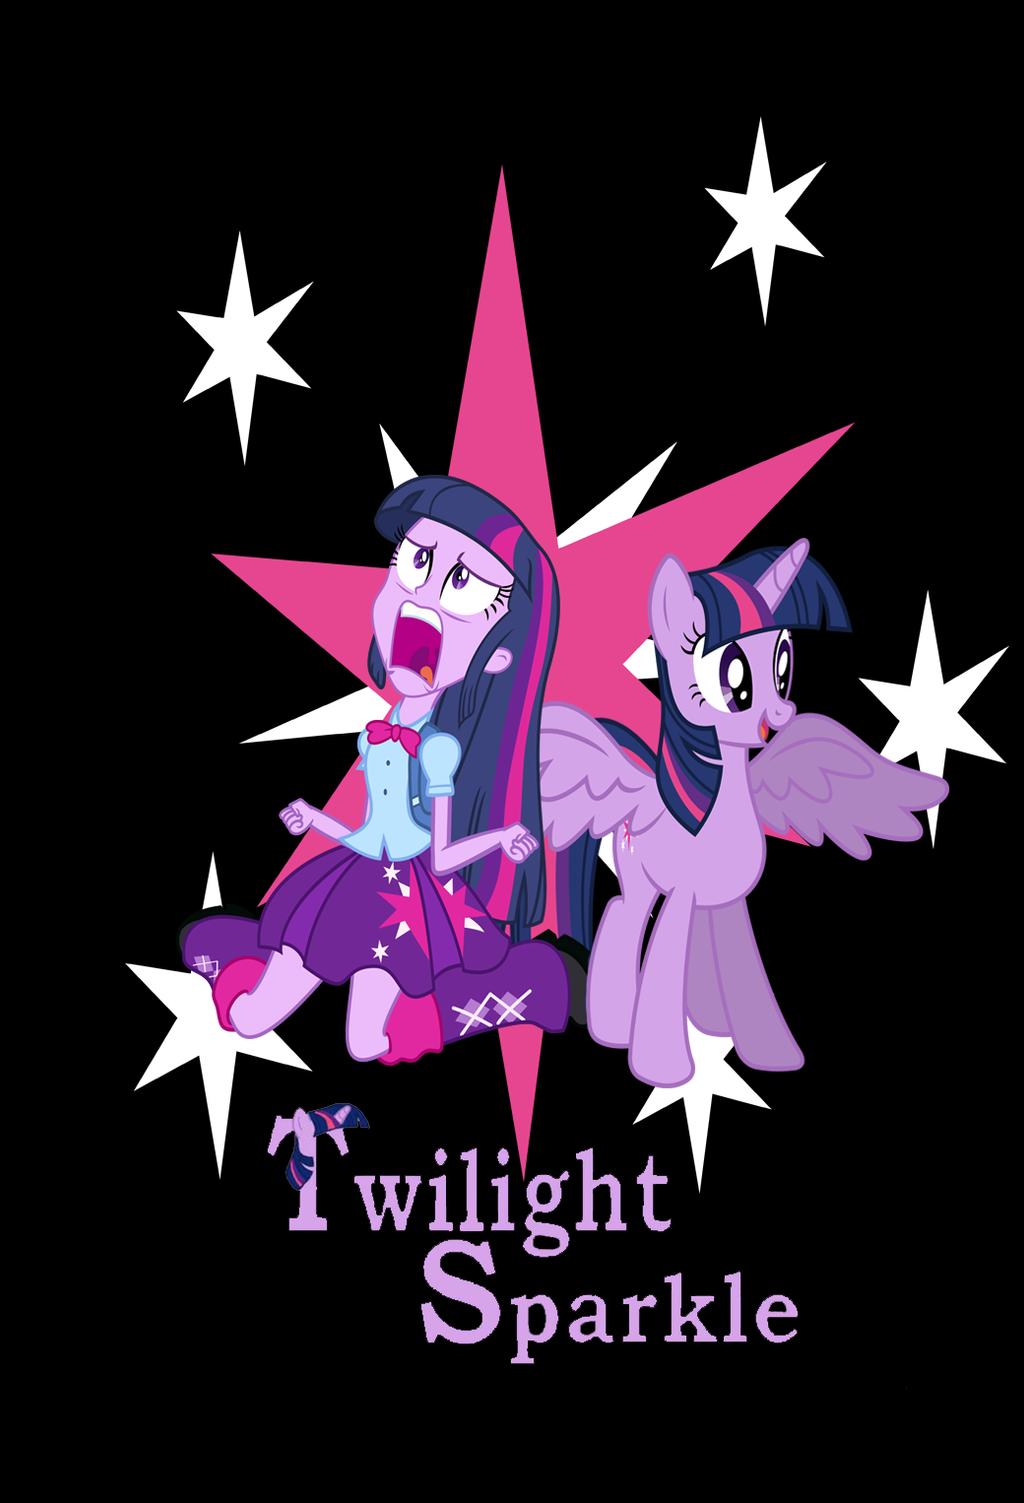 IOS 7 Twilight Sparkle Wallpaper By Krazy97151